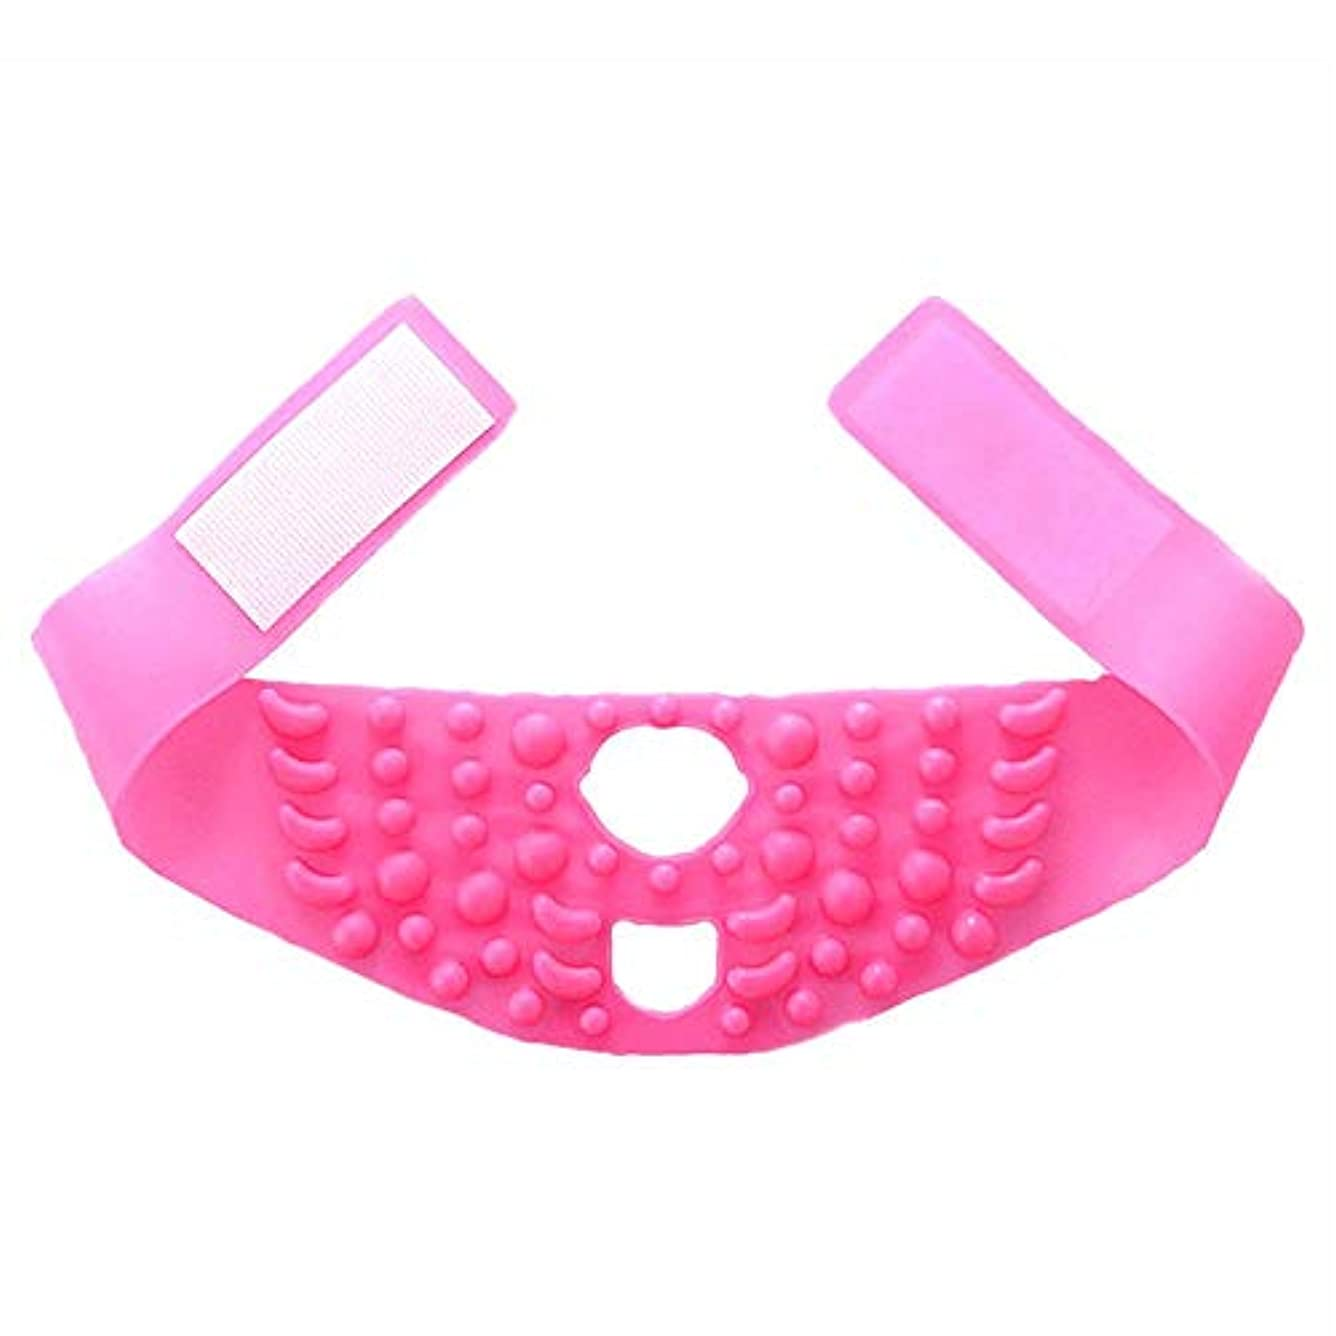 Minmin シンフェイスマスクシリコーンマッサージ引き締まった形の小さなVフェイスリフティングに薄いフェイスアーティファクト包帯を飾る - ピンク みんみんVラインフェイスマスク